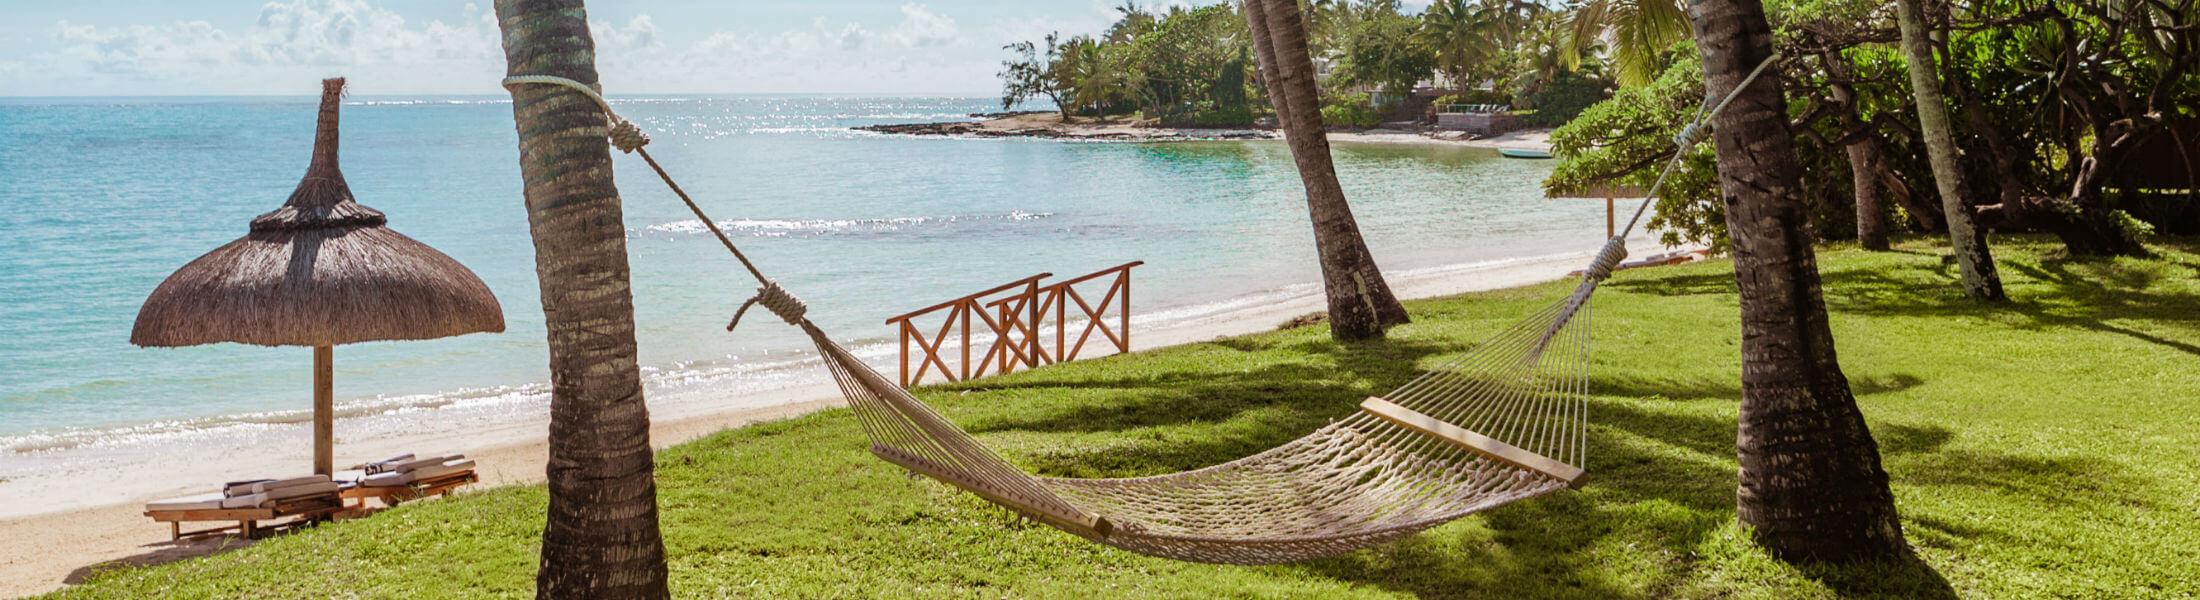 One&Only Le Saint Geran, Mauritius - beach with hammock